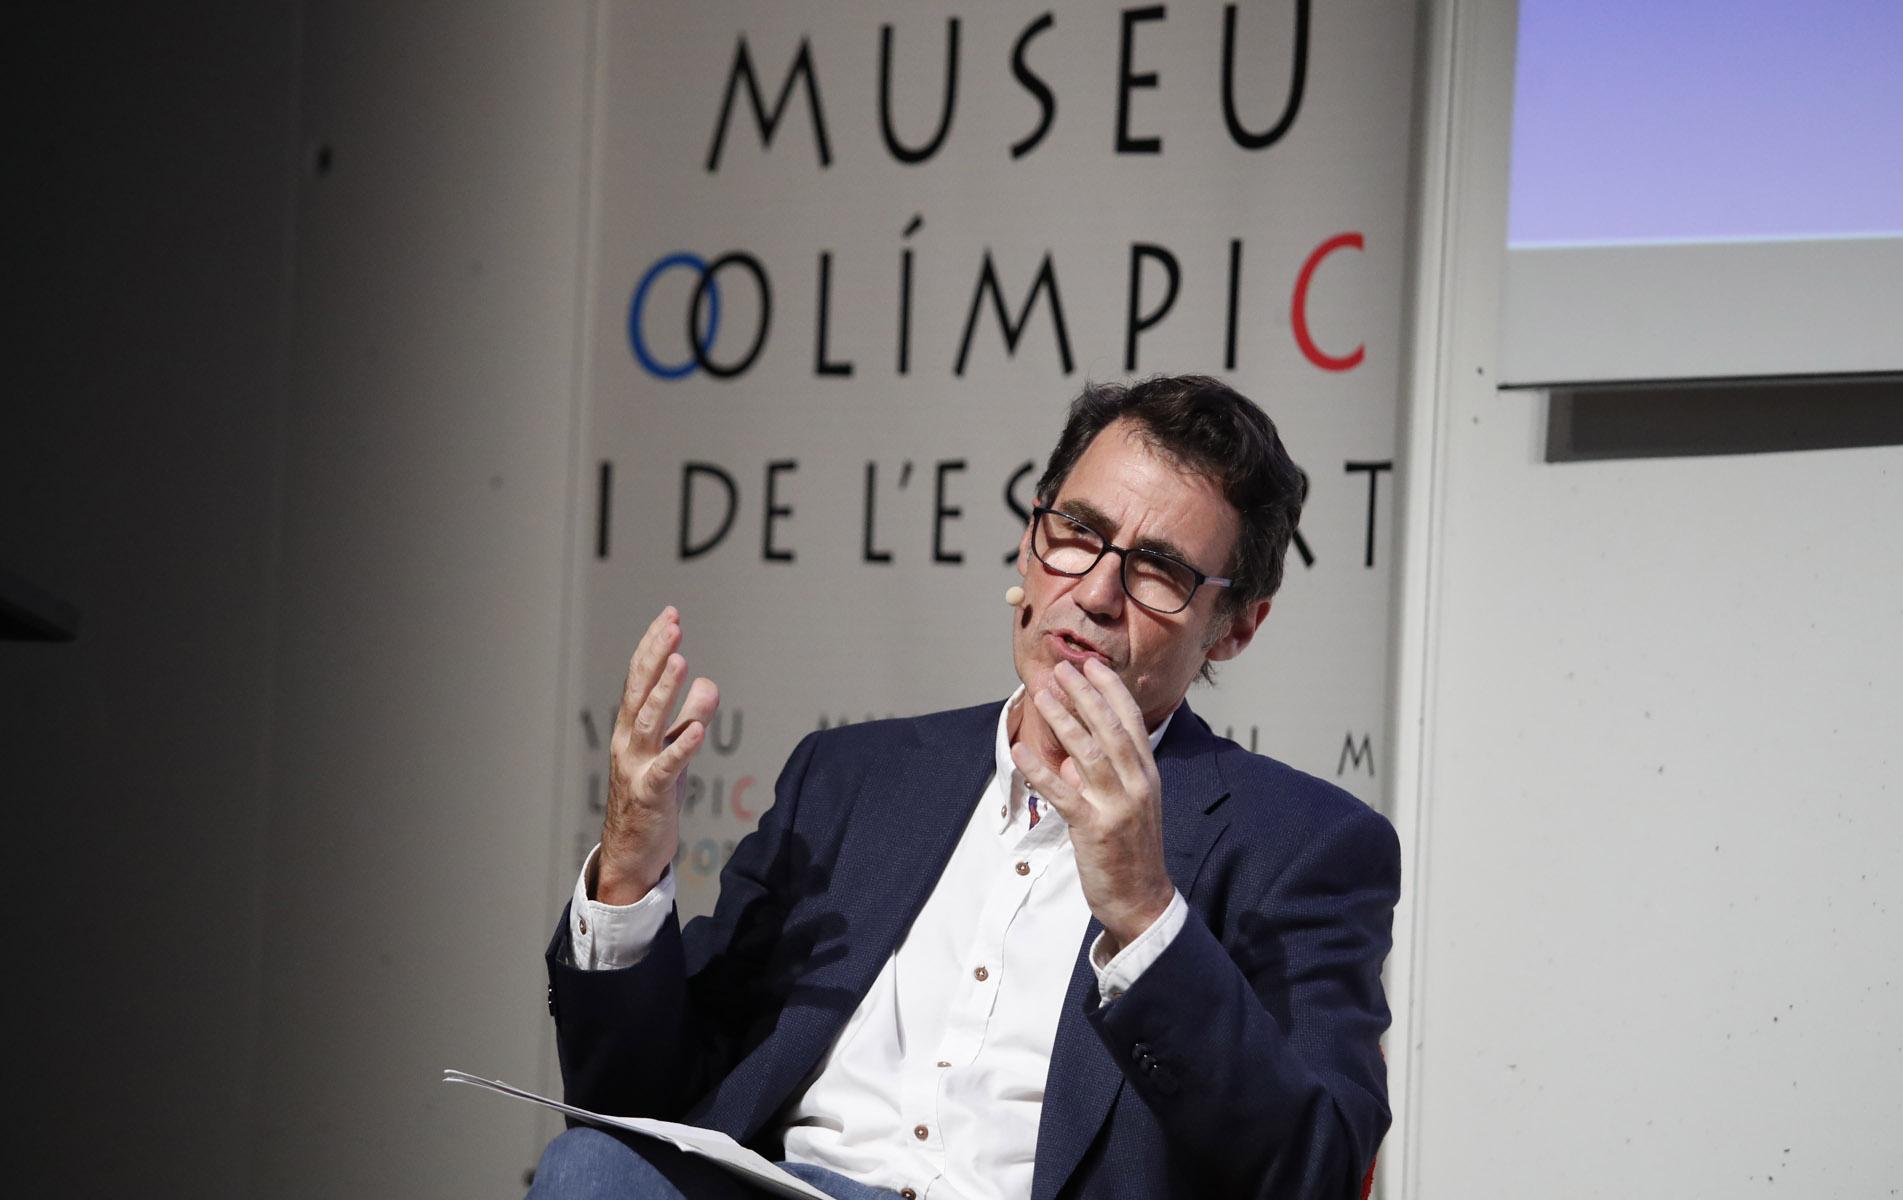 Forum-Museu-Olimpic--Dr-Brotons